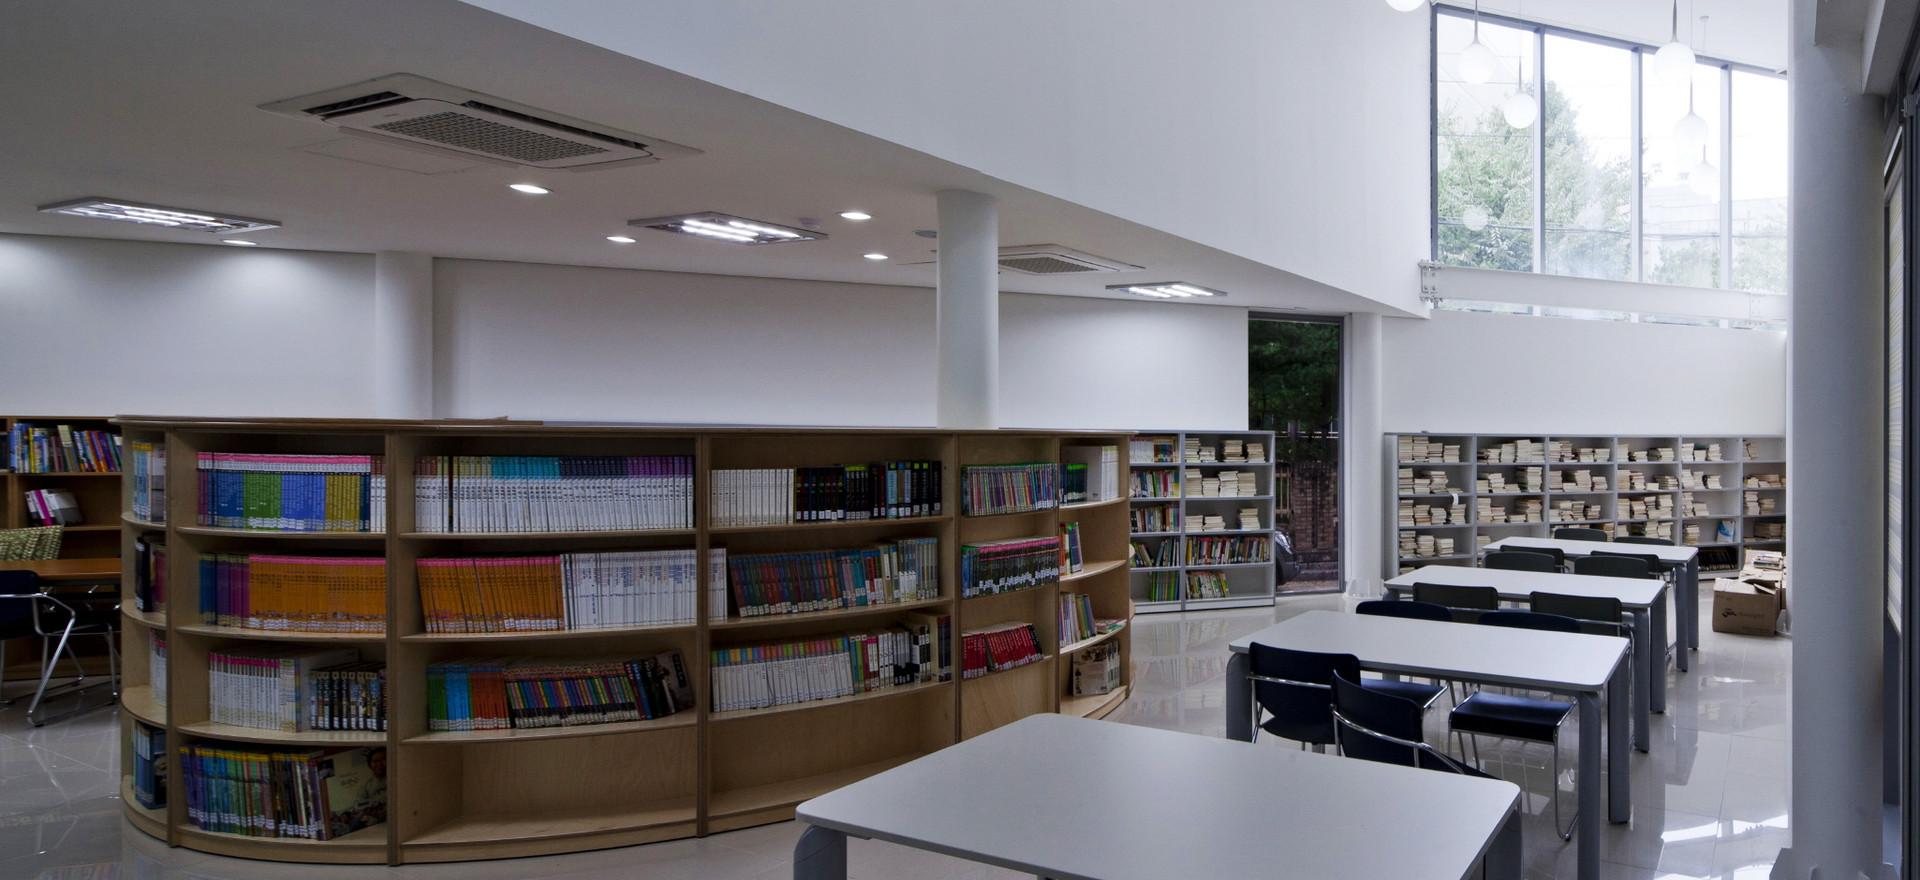 01 interior_s.jpg